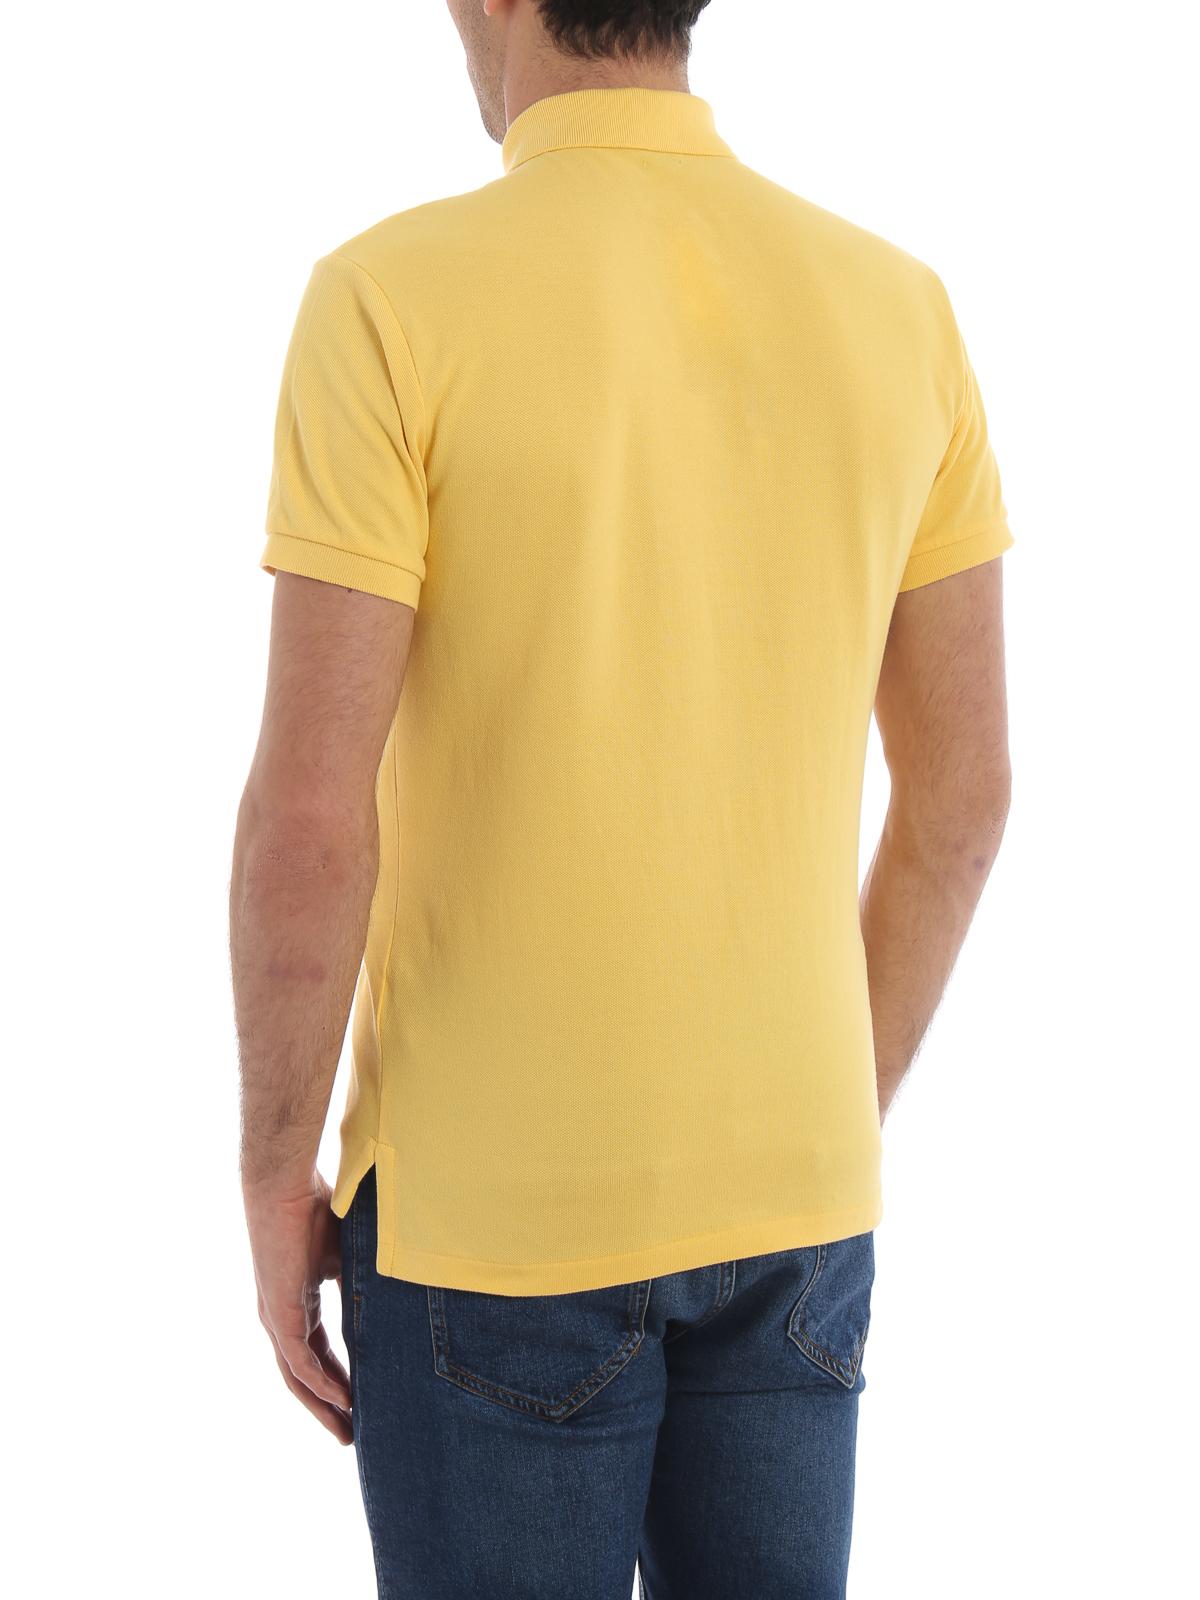 f7906614e1a529 Polo Ralph Lauren - Poloshirt - Gelb - Poloshirts - 710536856068